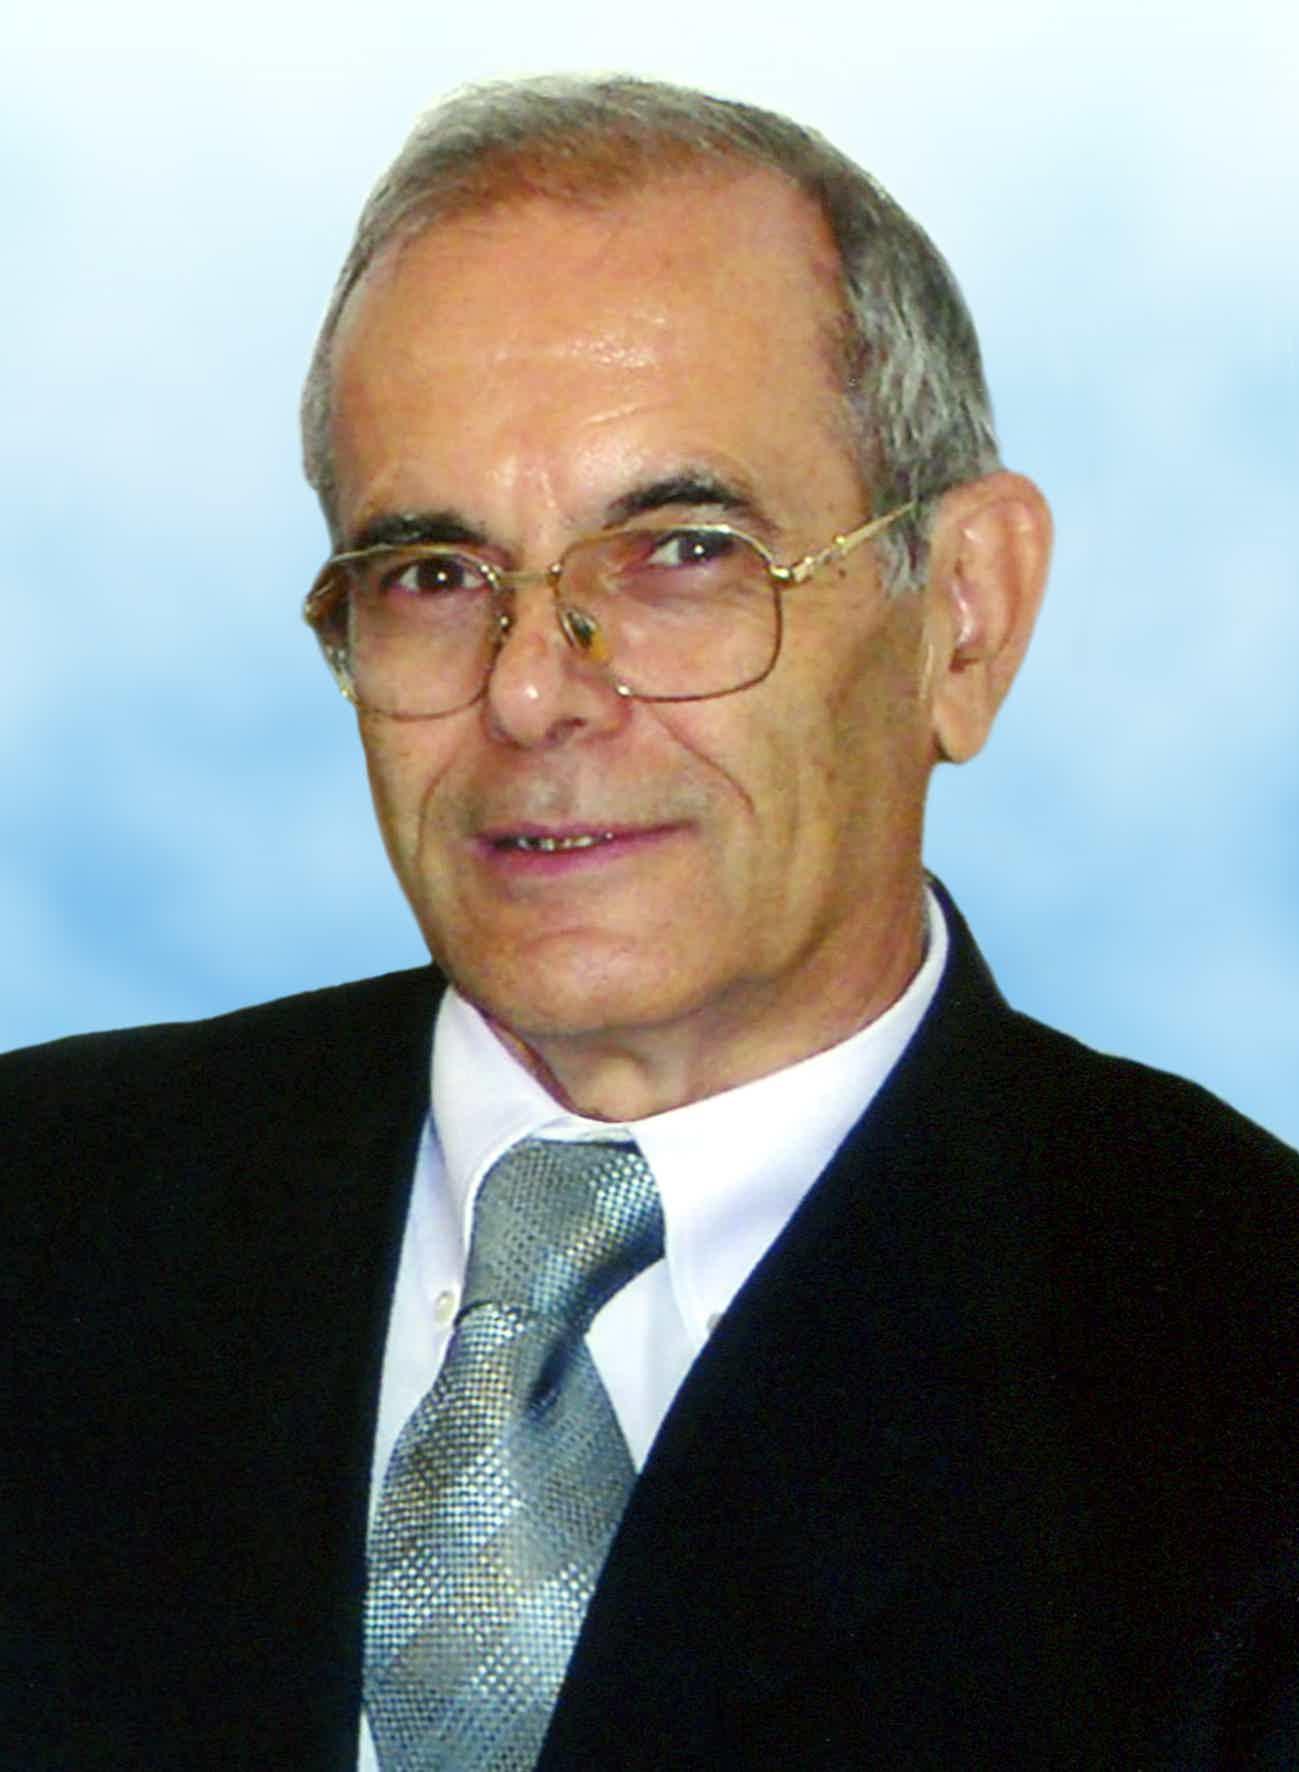 Marco Sardu